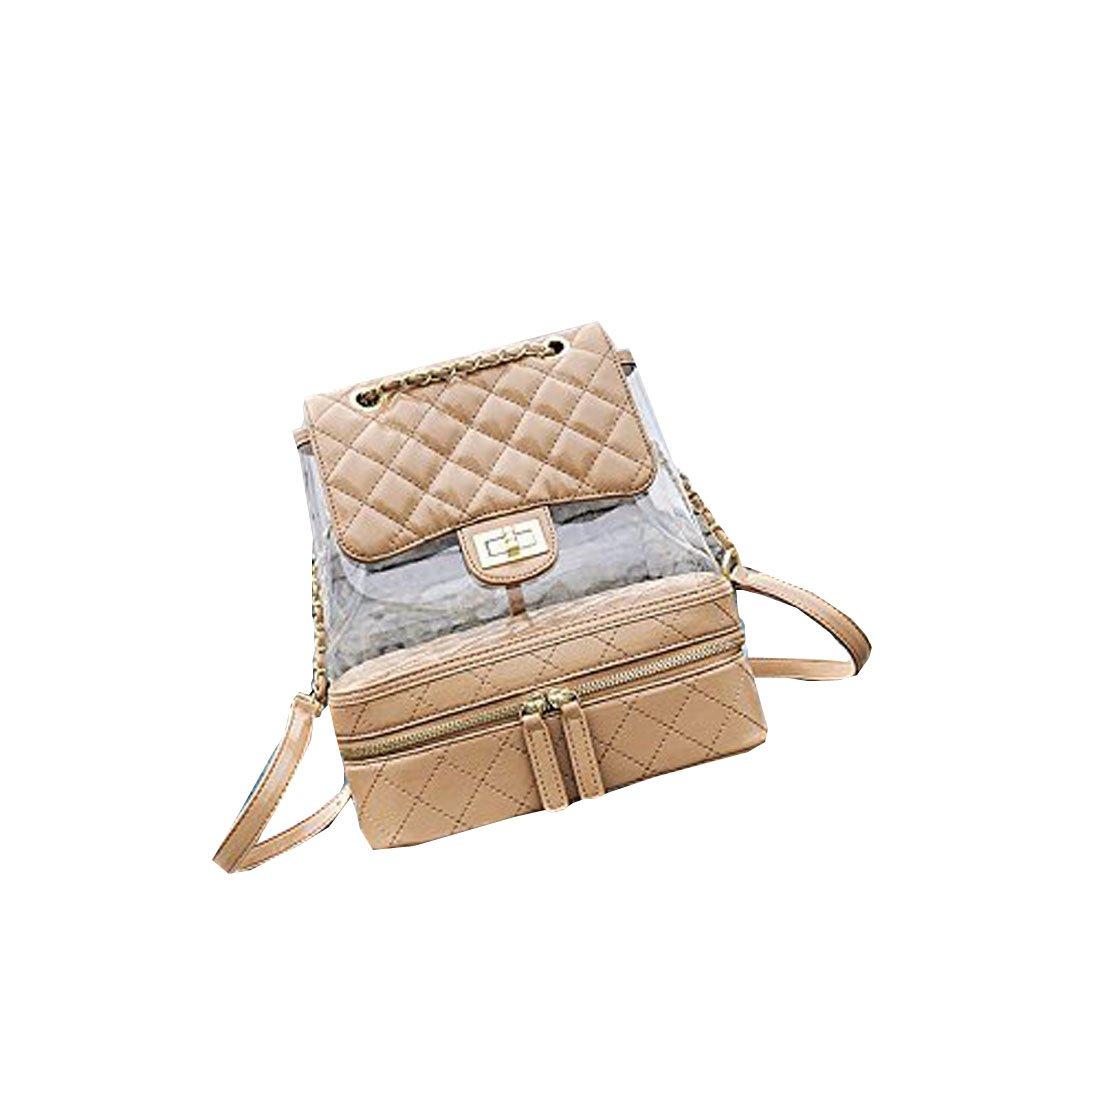 Chain backpack female summer fashion loose transparent backpack travel Bag student shopping handbag